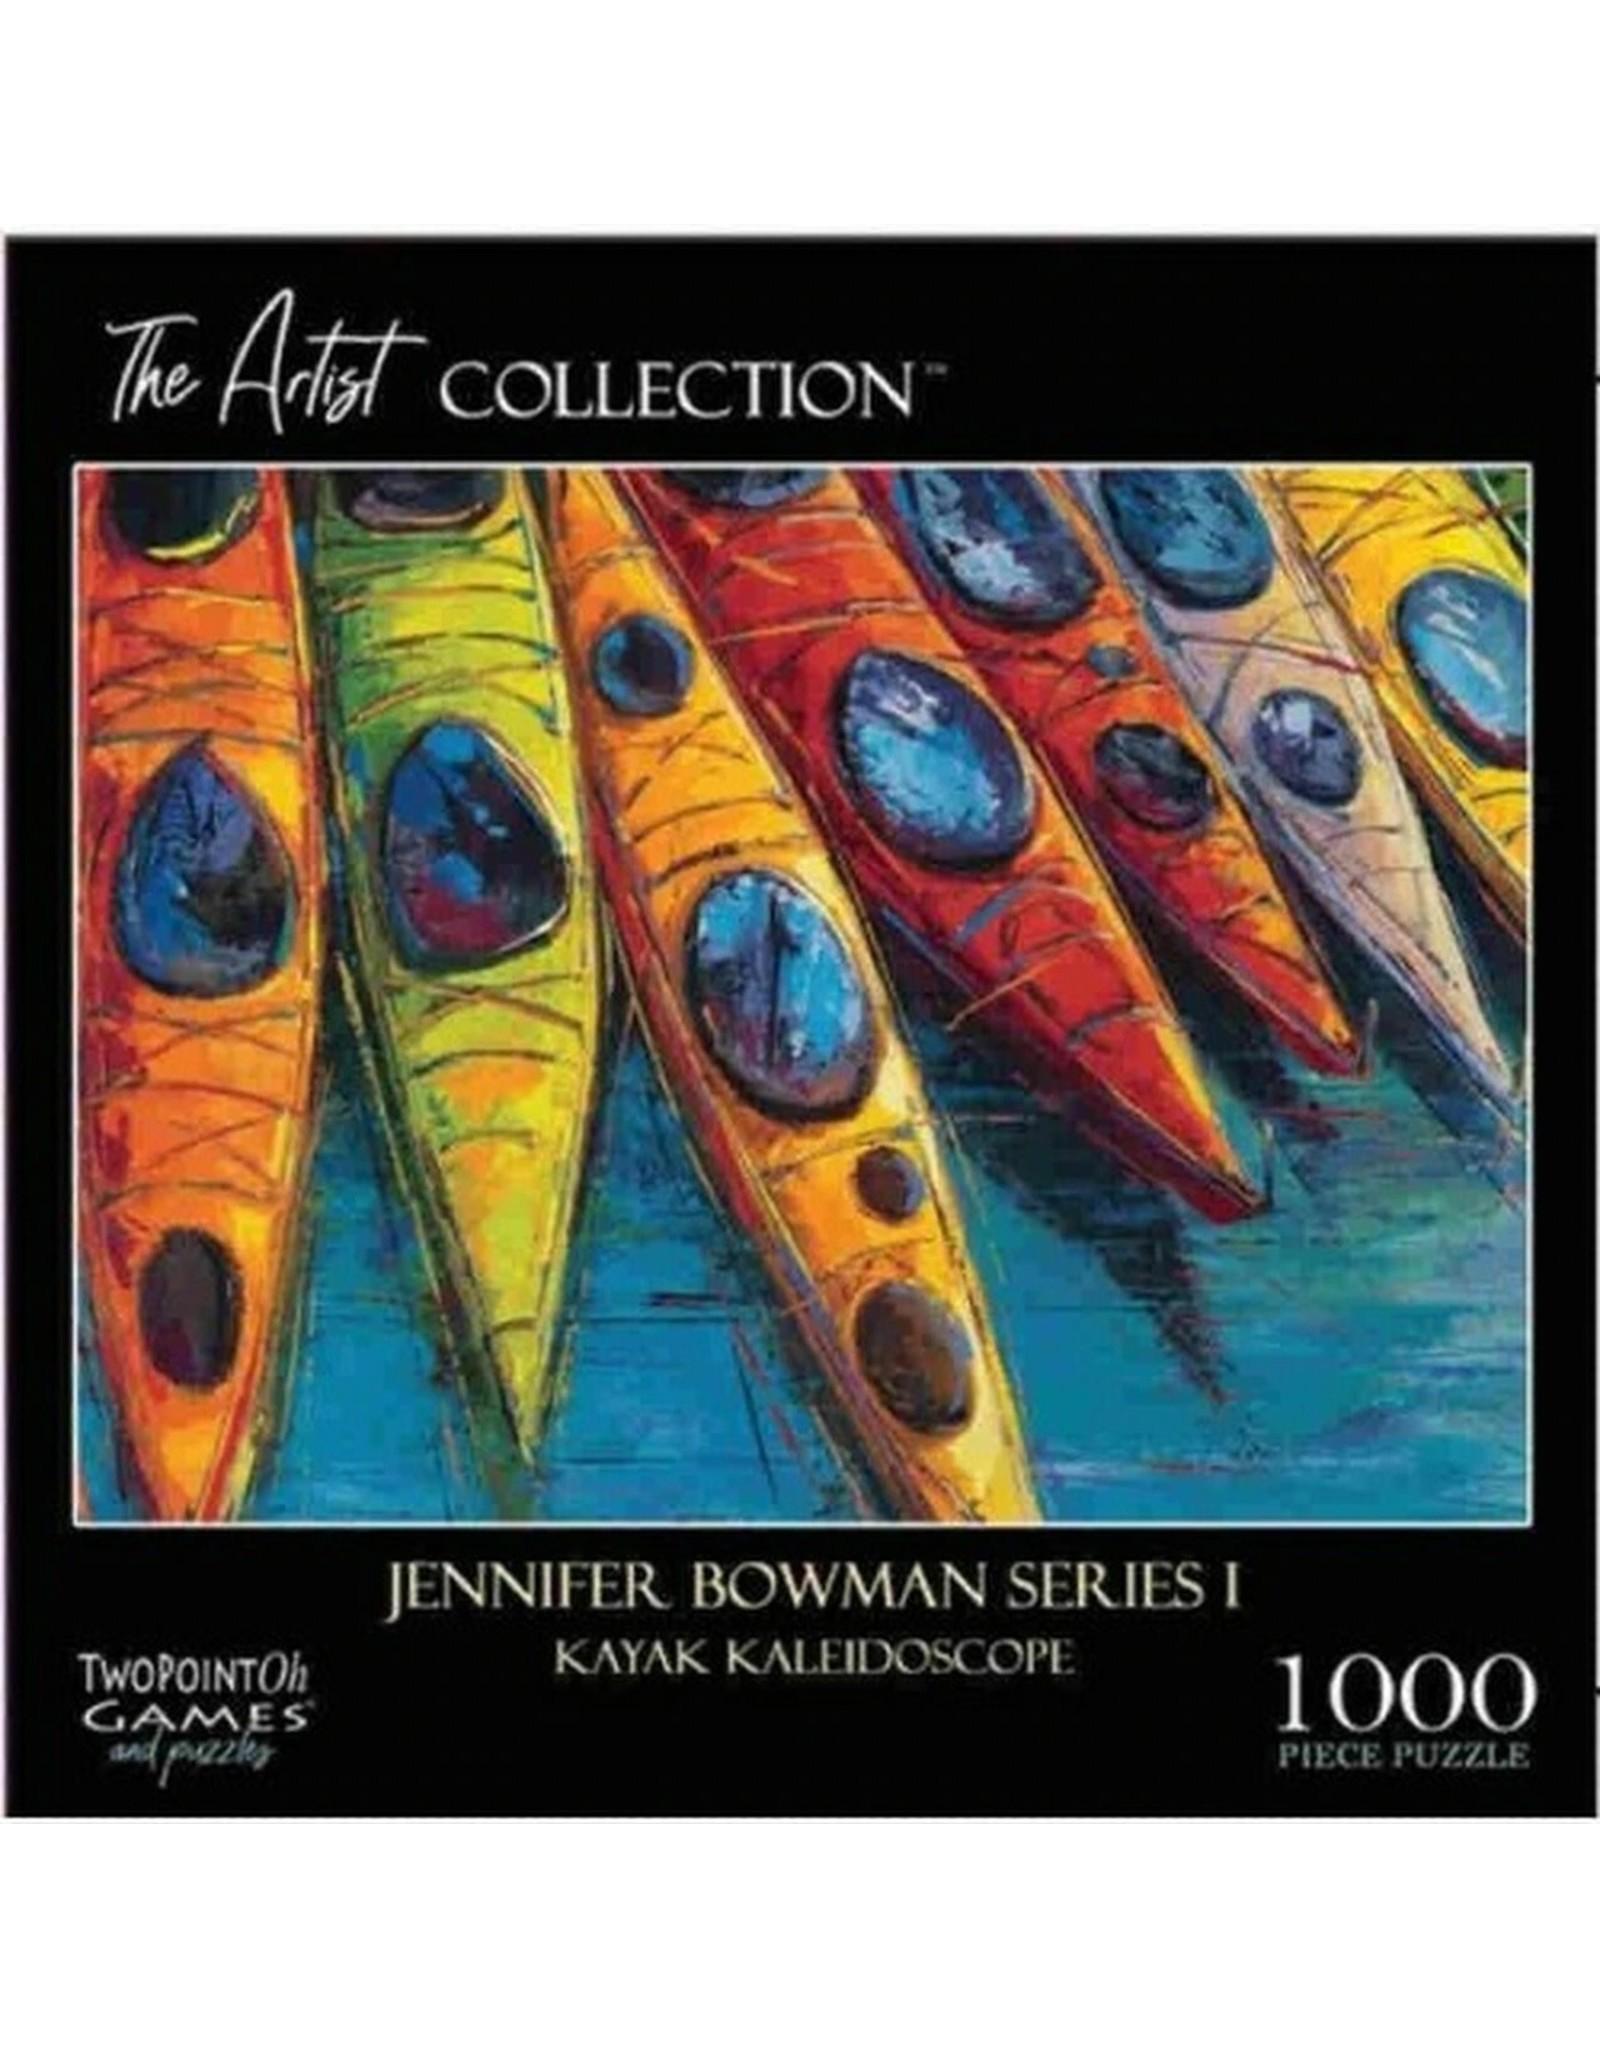 1000 PIECE THE ARTIST COLLECTION JENNIFER BOWMAN SERIES 1 KAYAK KALEIDOSCOPE PUZZLE